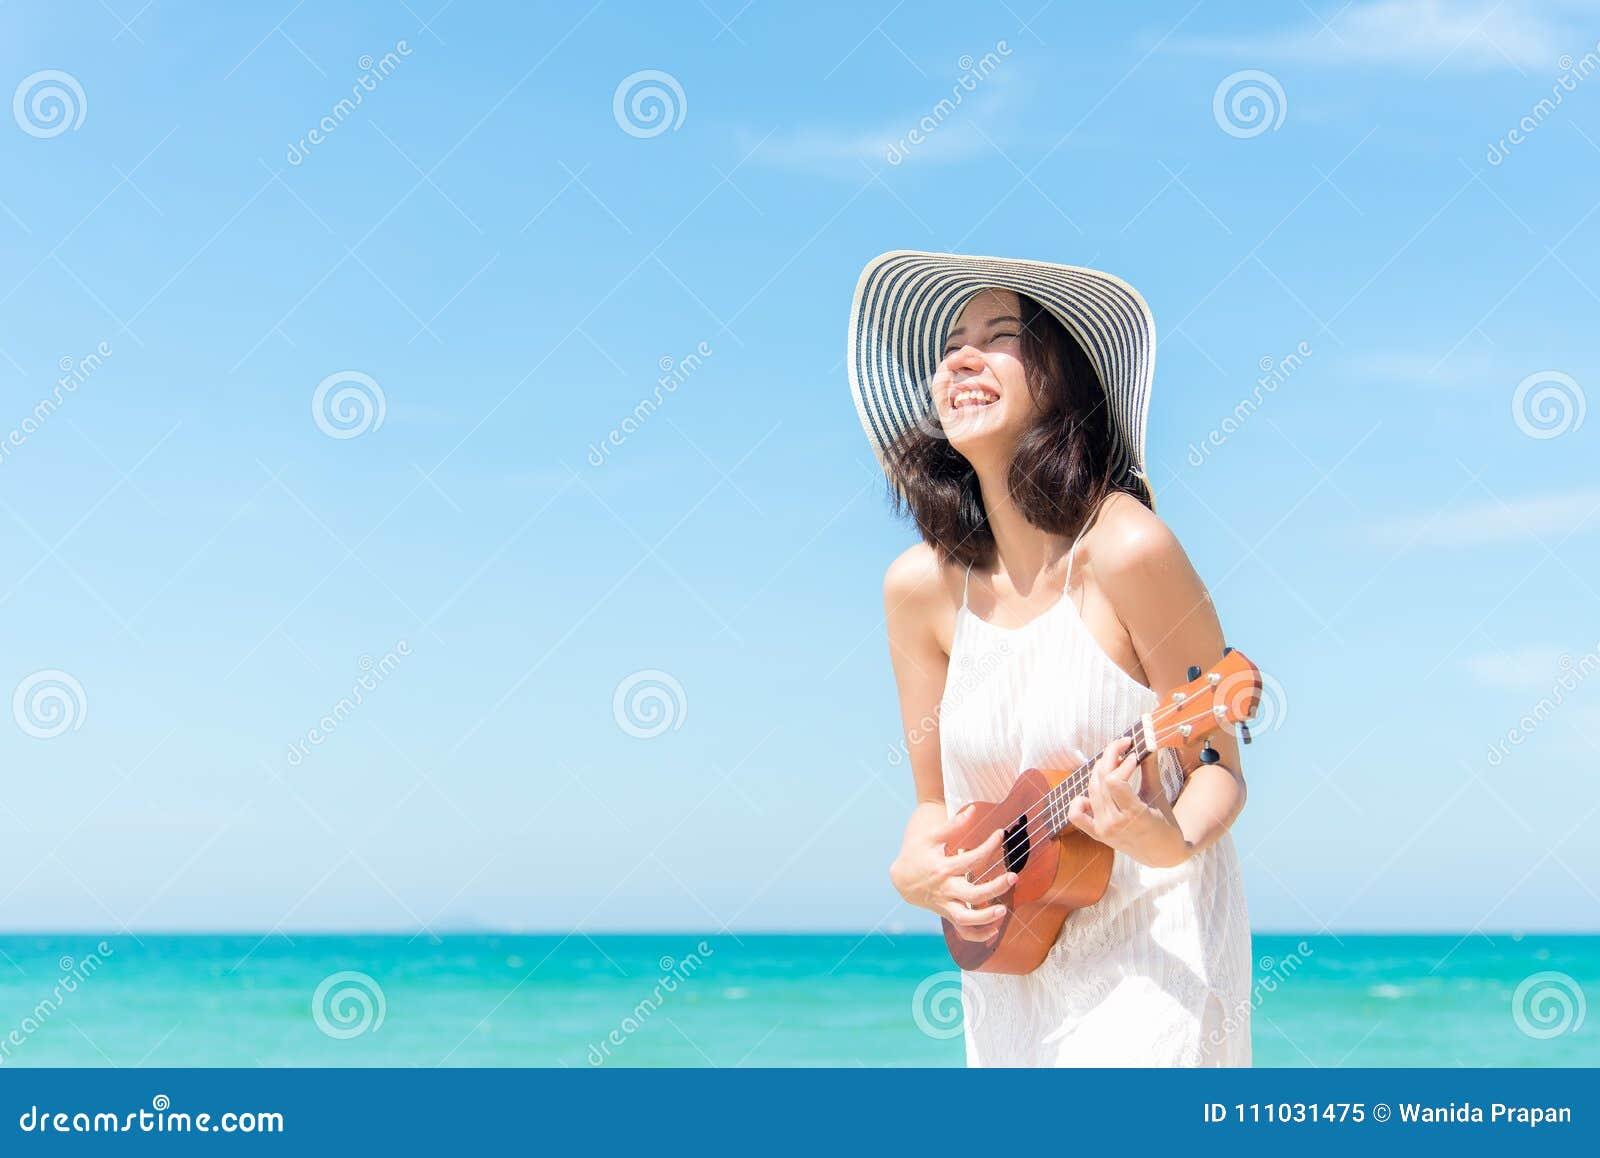 Katya krasnodar夏天领土假期 放松和播放在海滩的嗅到的亚裔妇女尤克里里琴,很愉快和豪华在假日夏天,